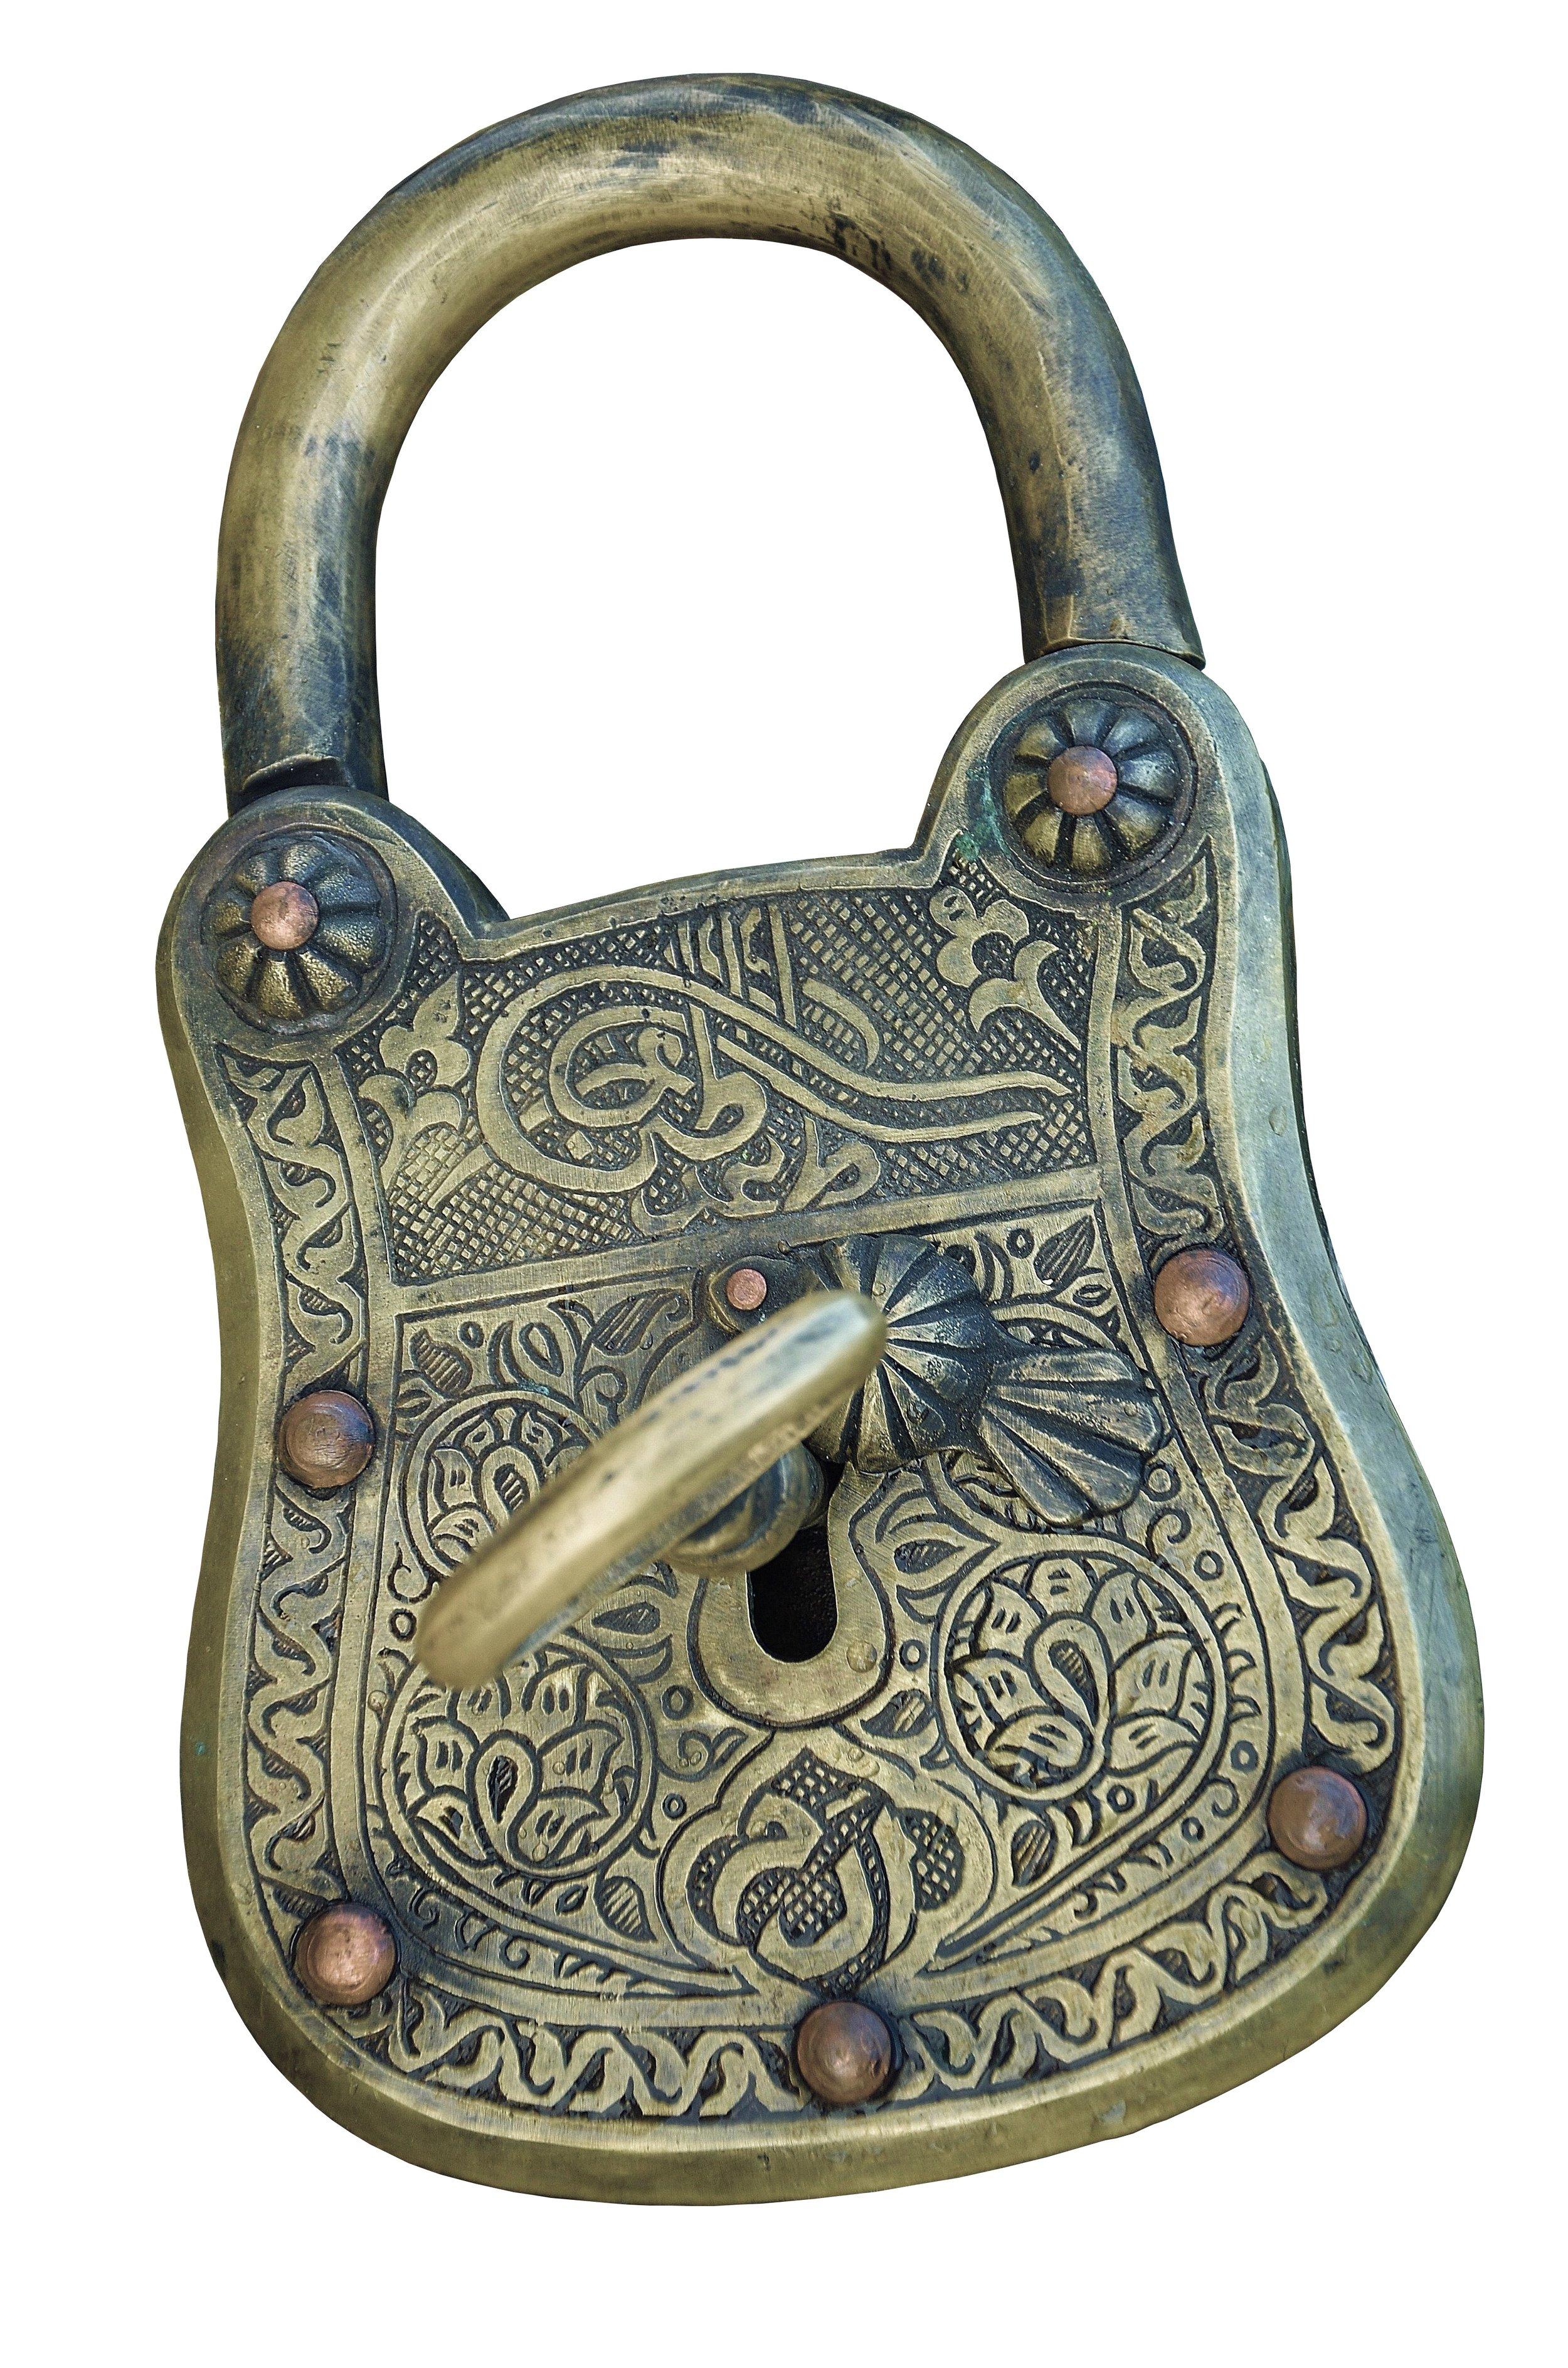 ancient-antique-art-532409.jpg